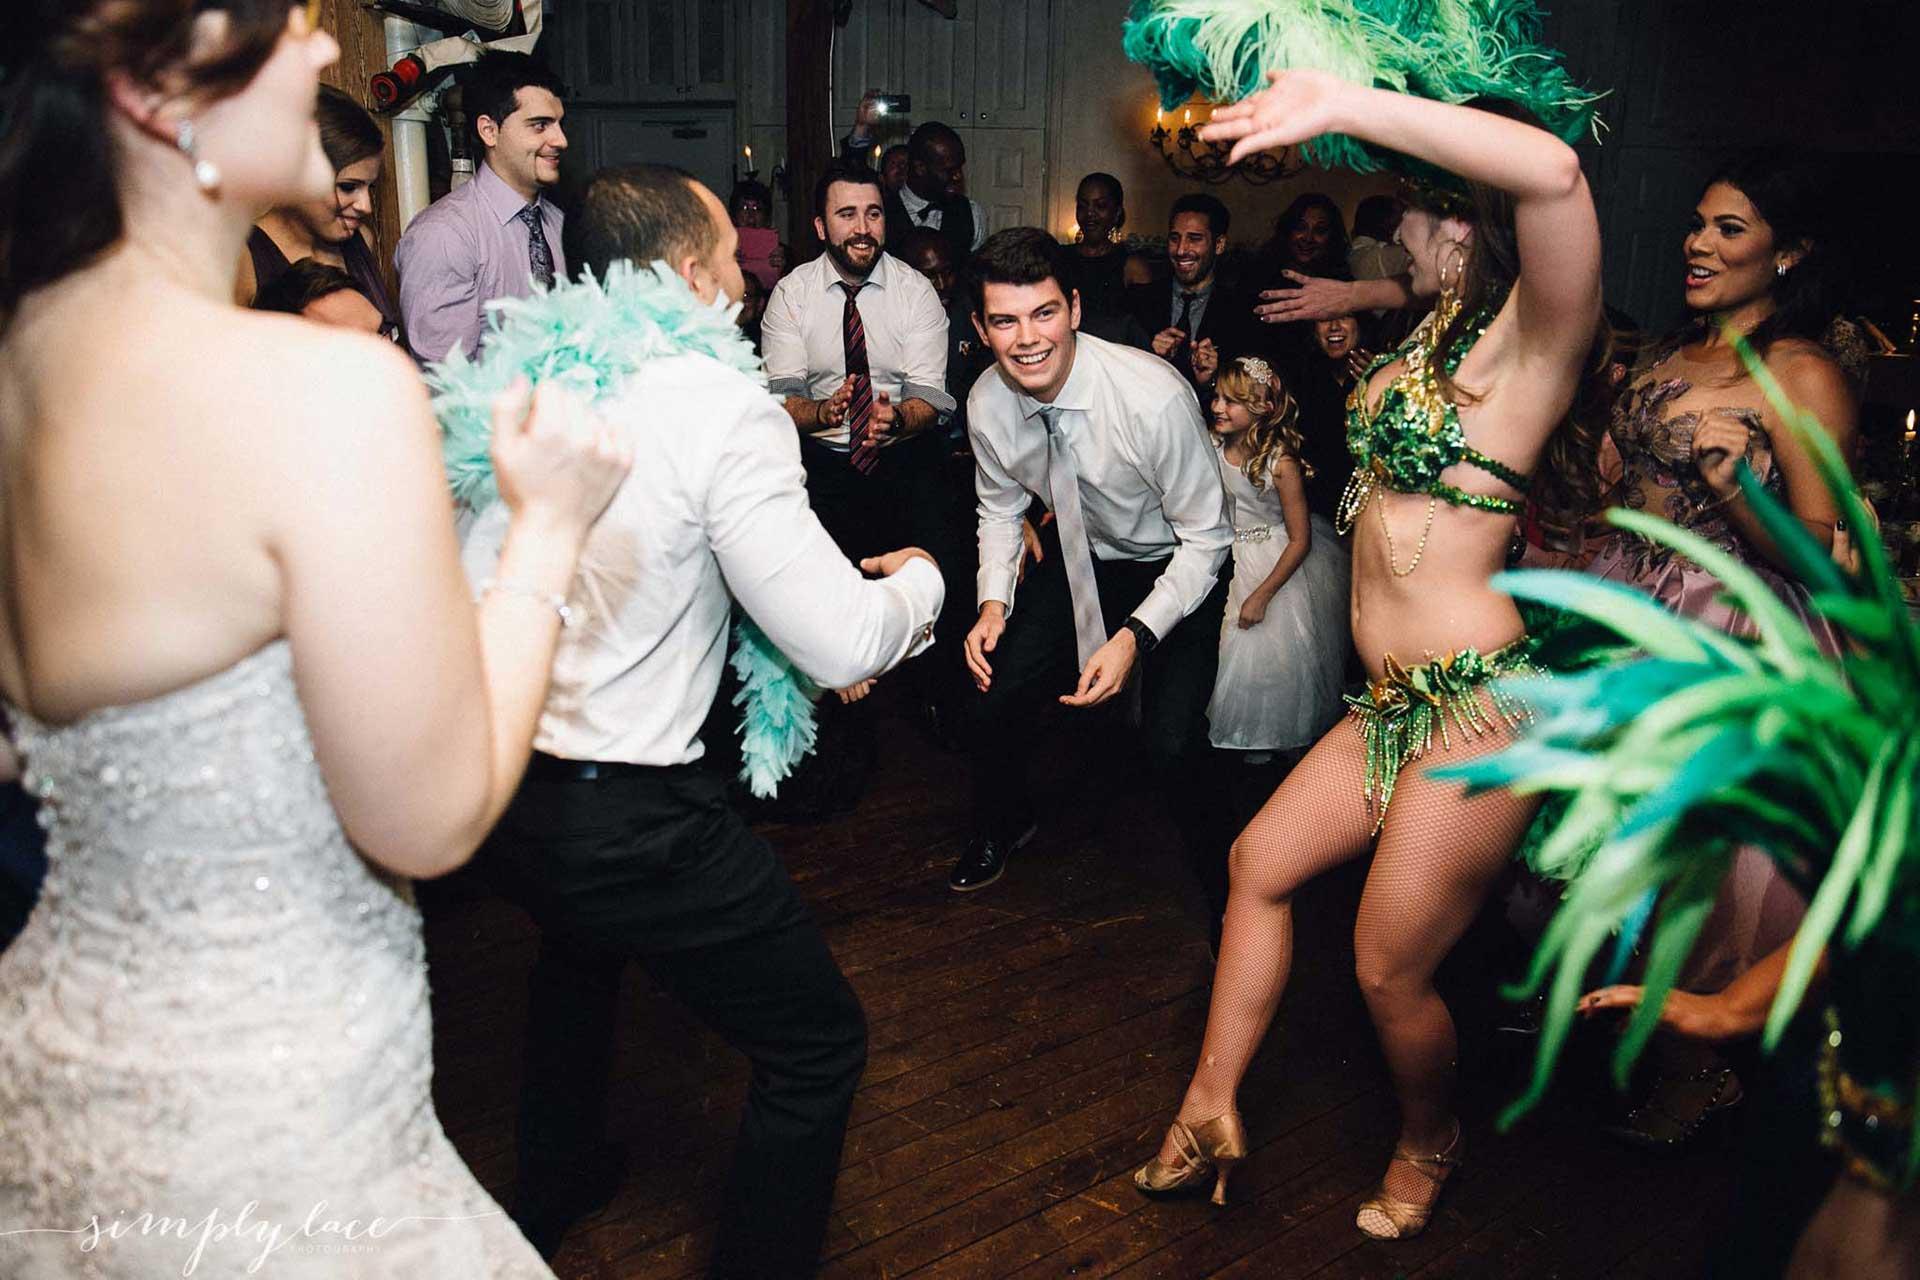 Wedding Venues Toronto - Wedding Dancing - Entertainment